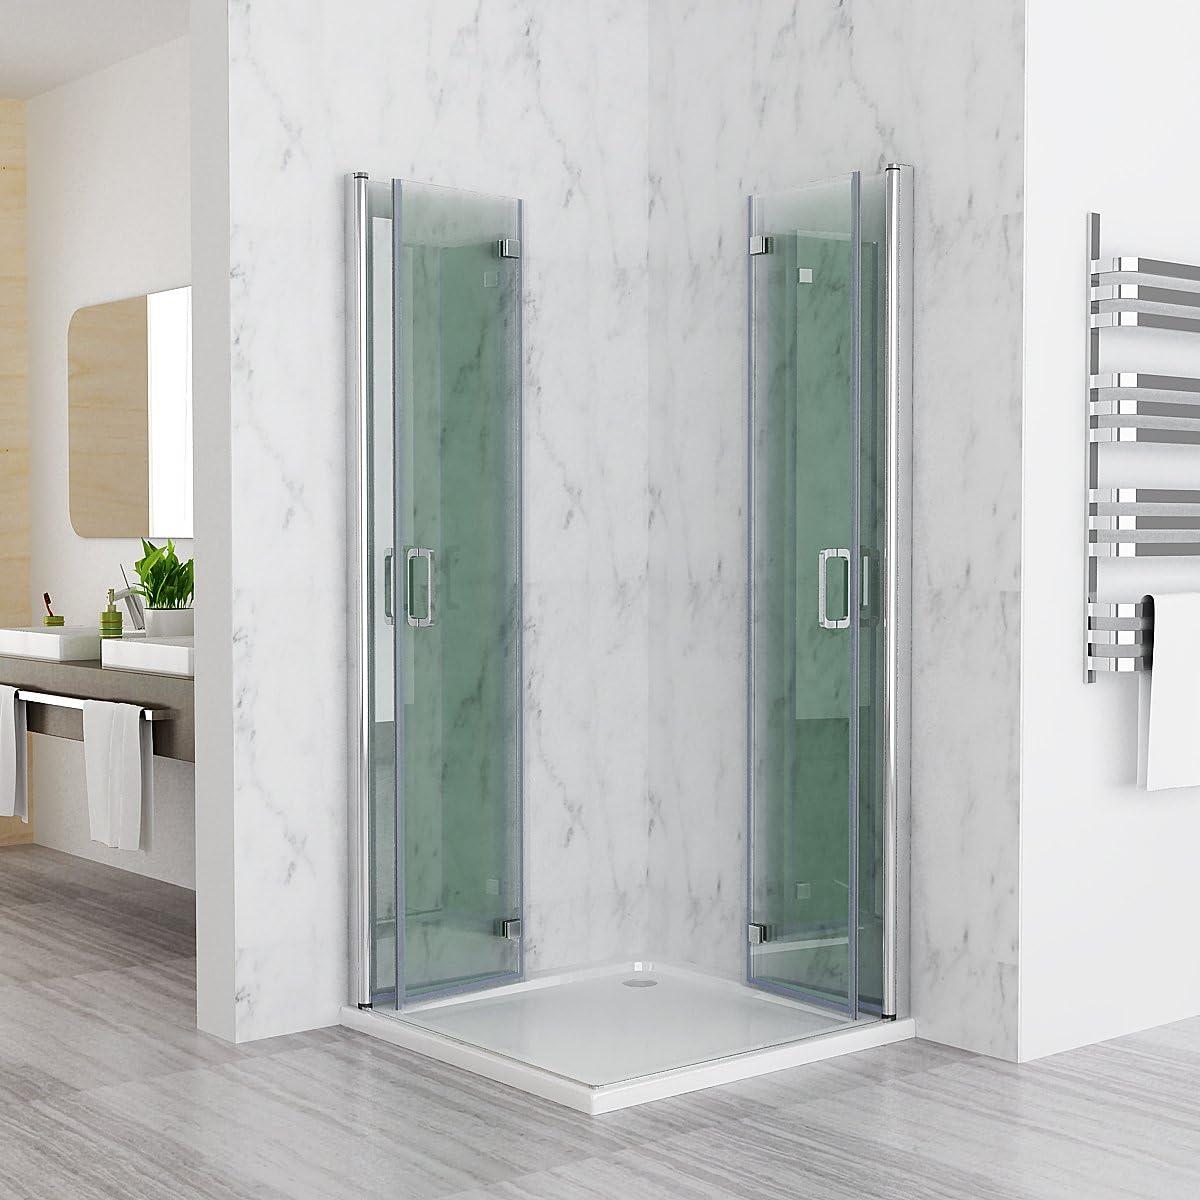 120 x 100 x 197 cm Mampara de ducha esquina. Ducha Puerta plegable ducha pared DAP: Amazon.es: Bricolaje y herramientas